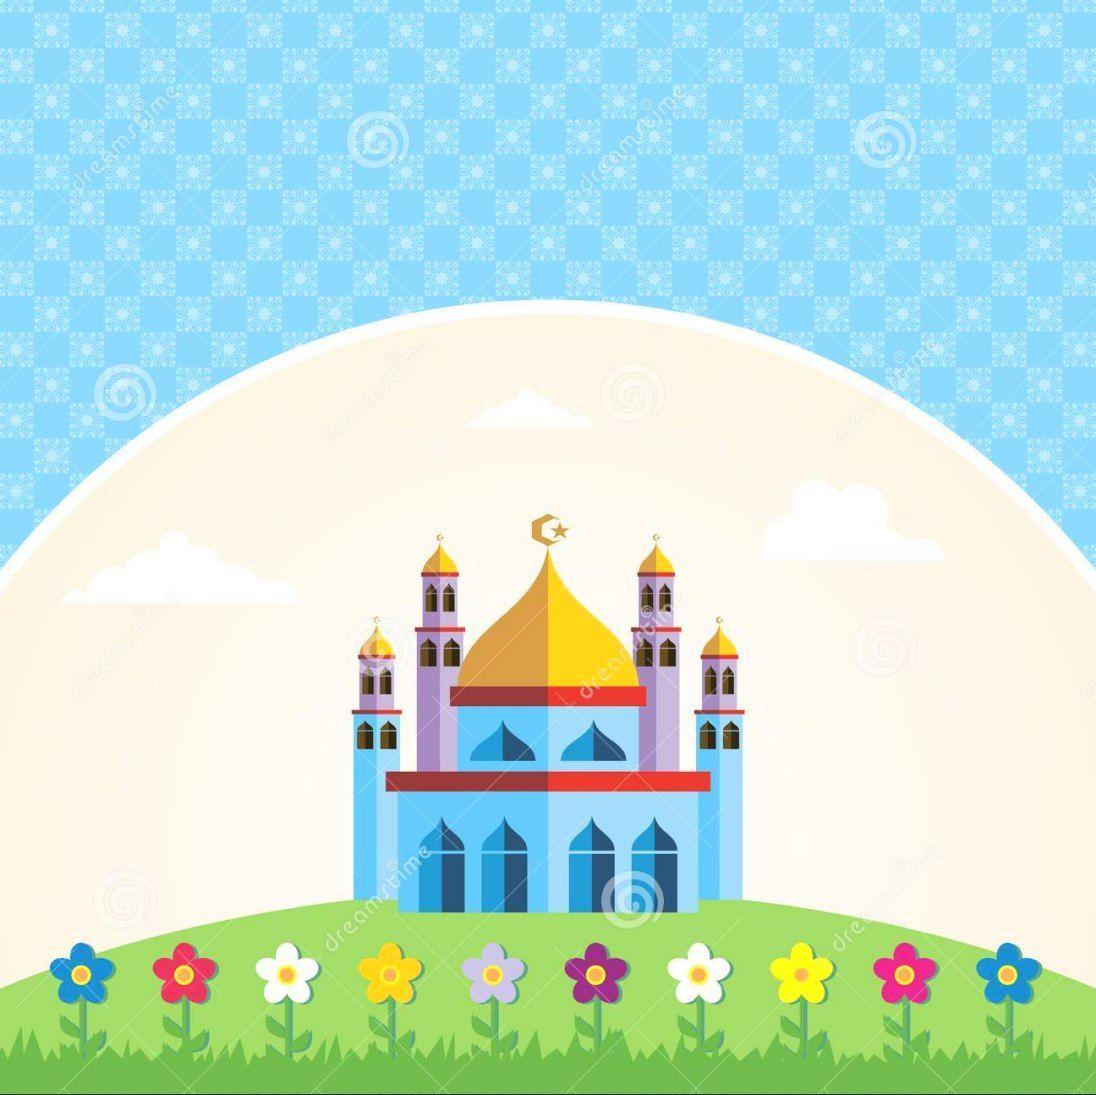 Gambar Masjid Kartun Gambar Animasi